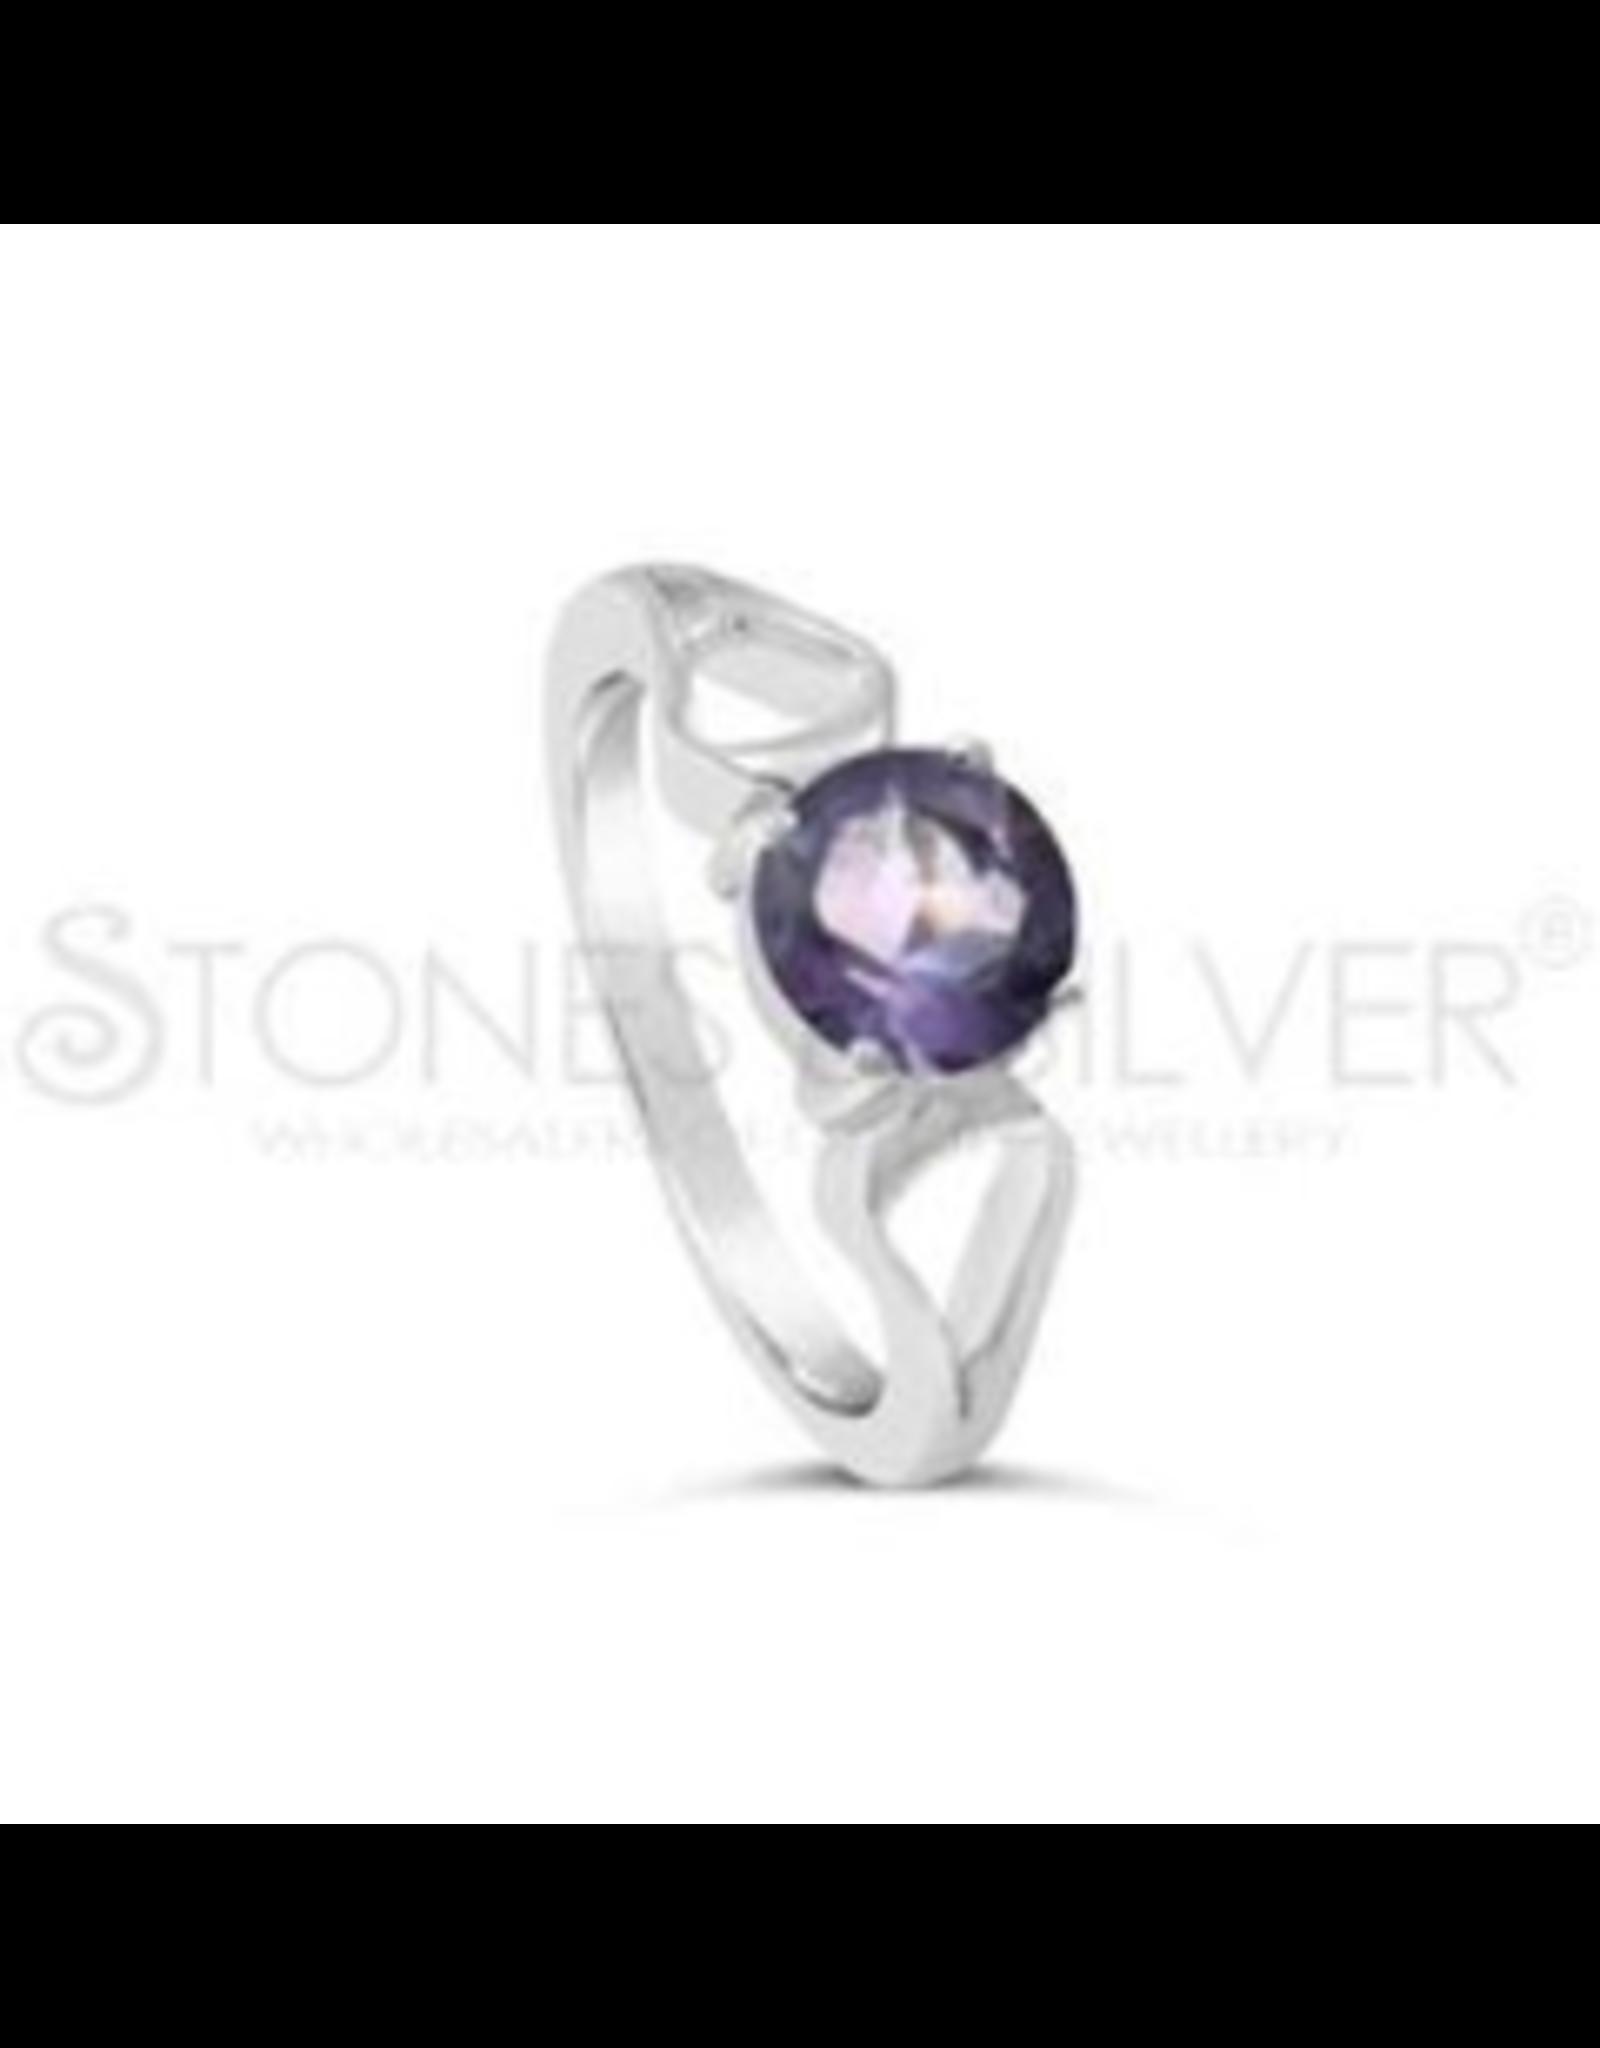 Stones & Silver Amethyst Ring 7 x 7mm